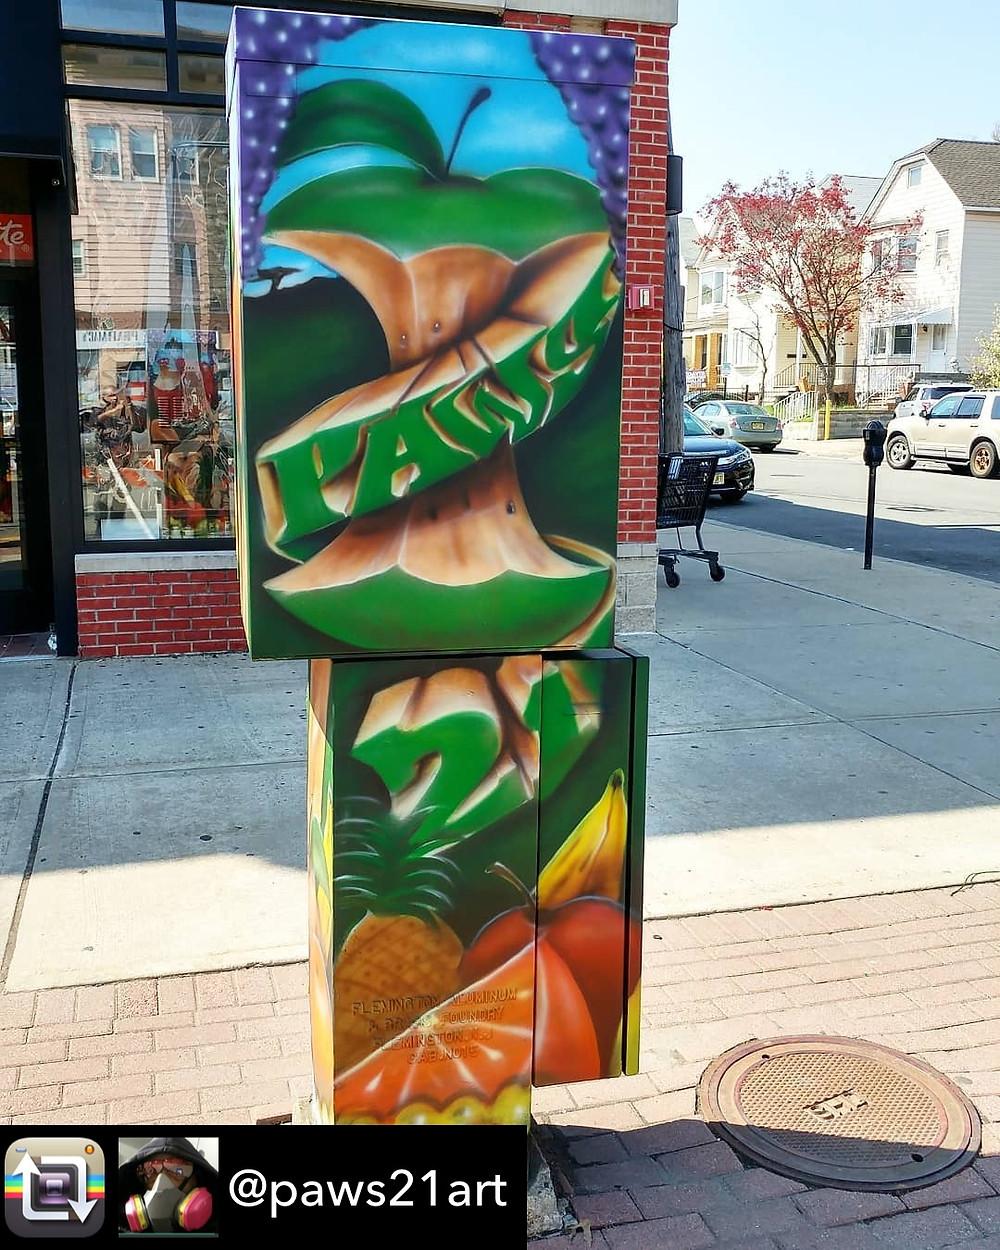 Pawsart21 Art On Box - Avenue C & 26th Street